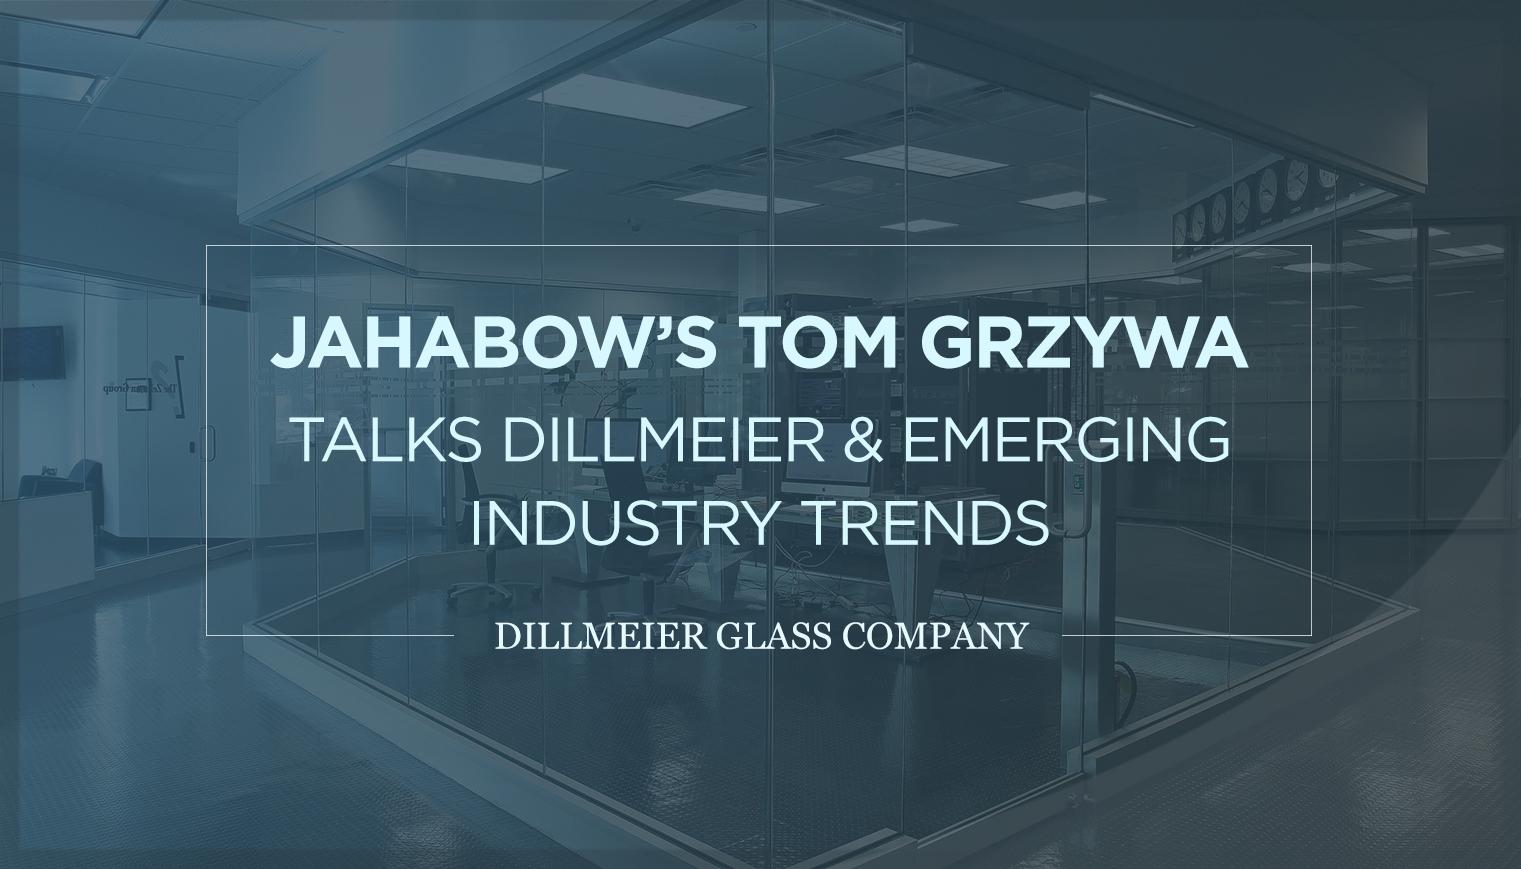 Jahabow's Tom Grzywa Talks Dillmeier & Emerging Industry Trends